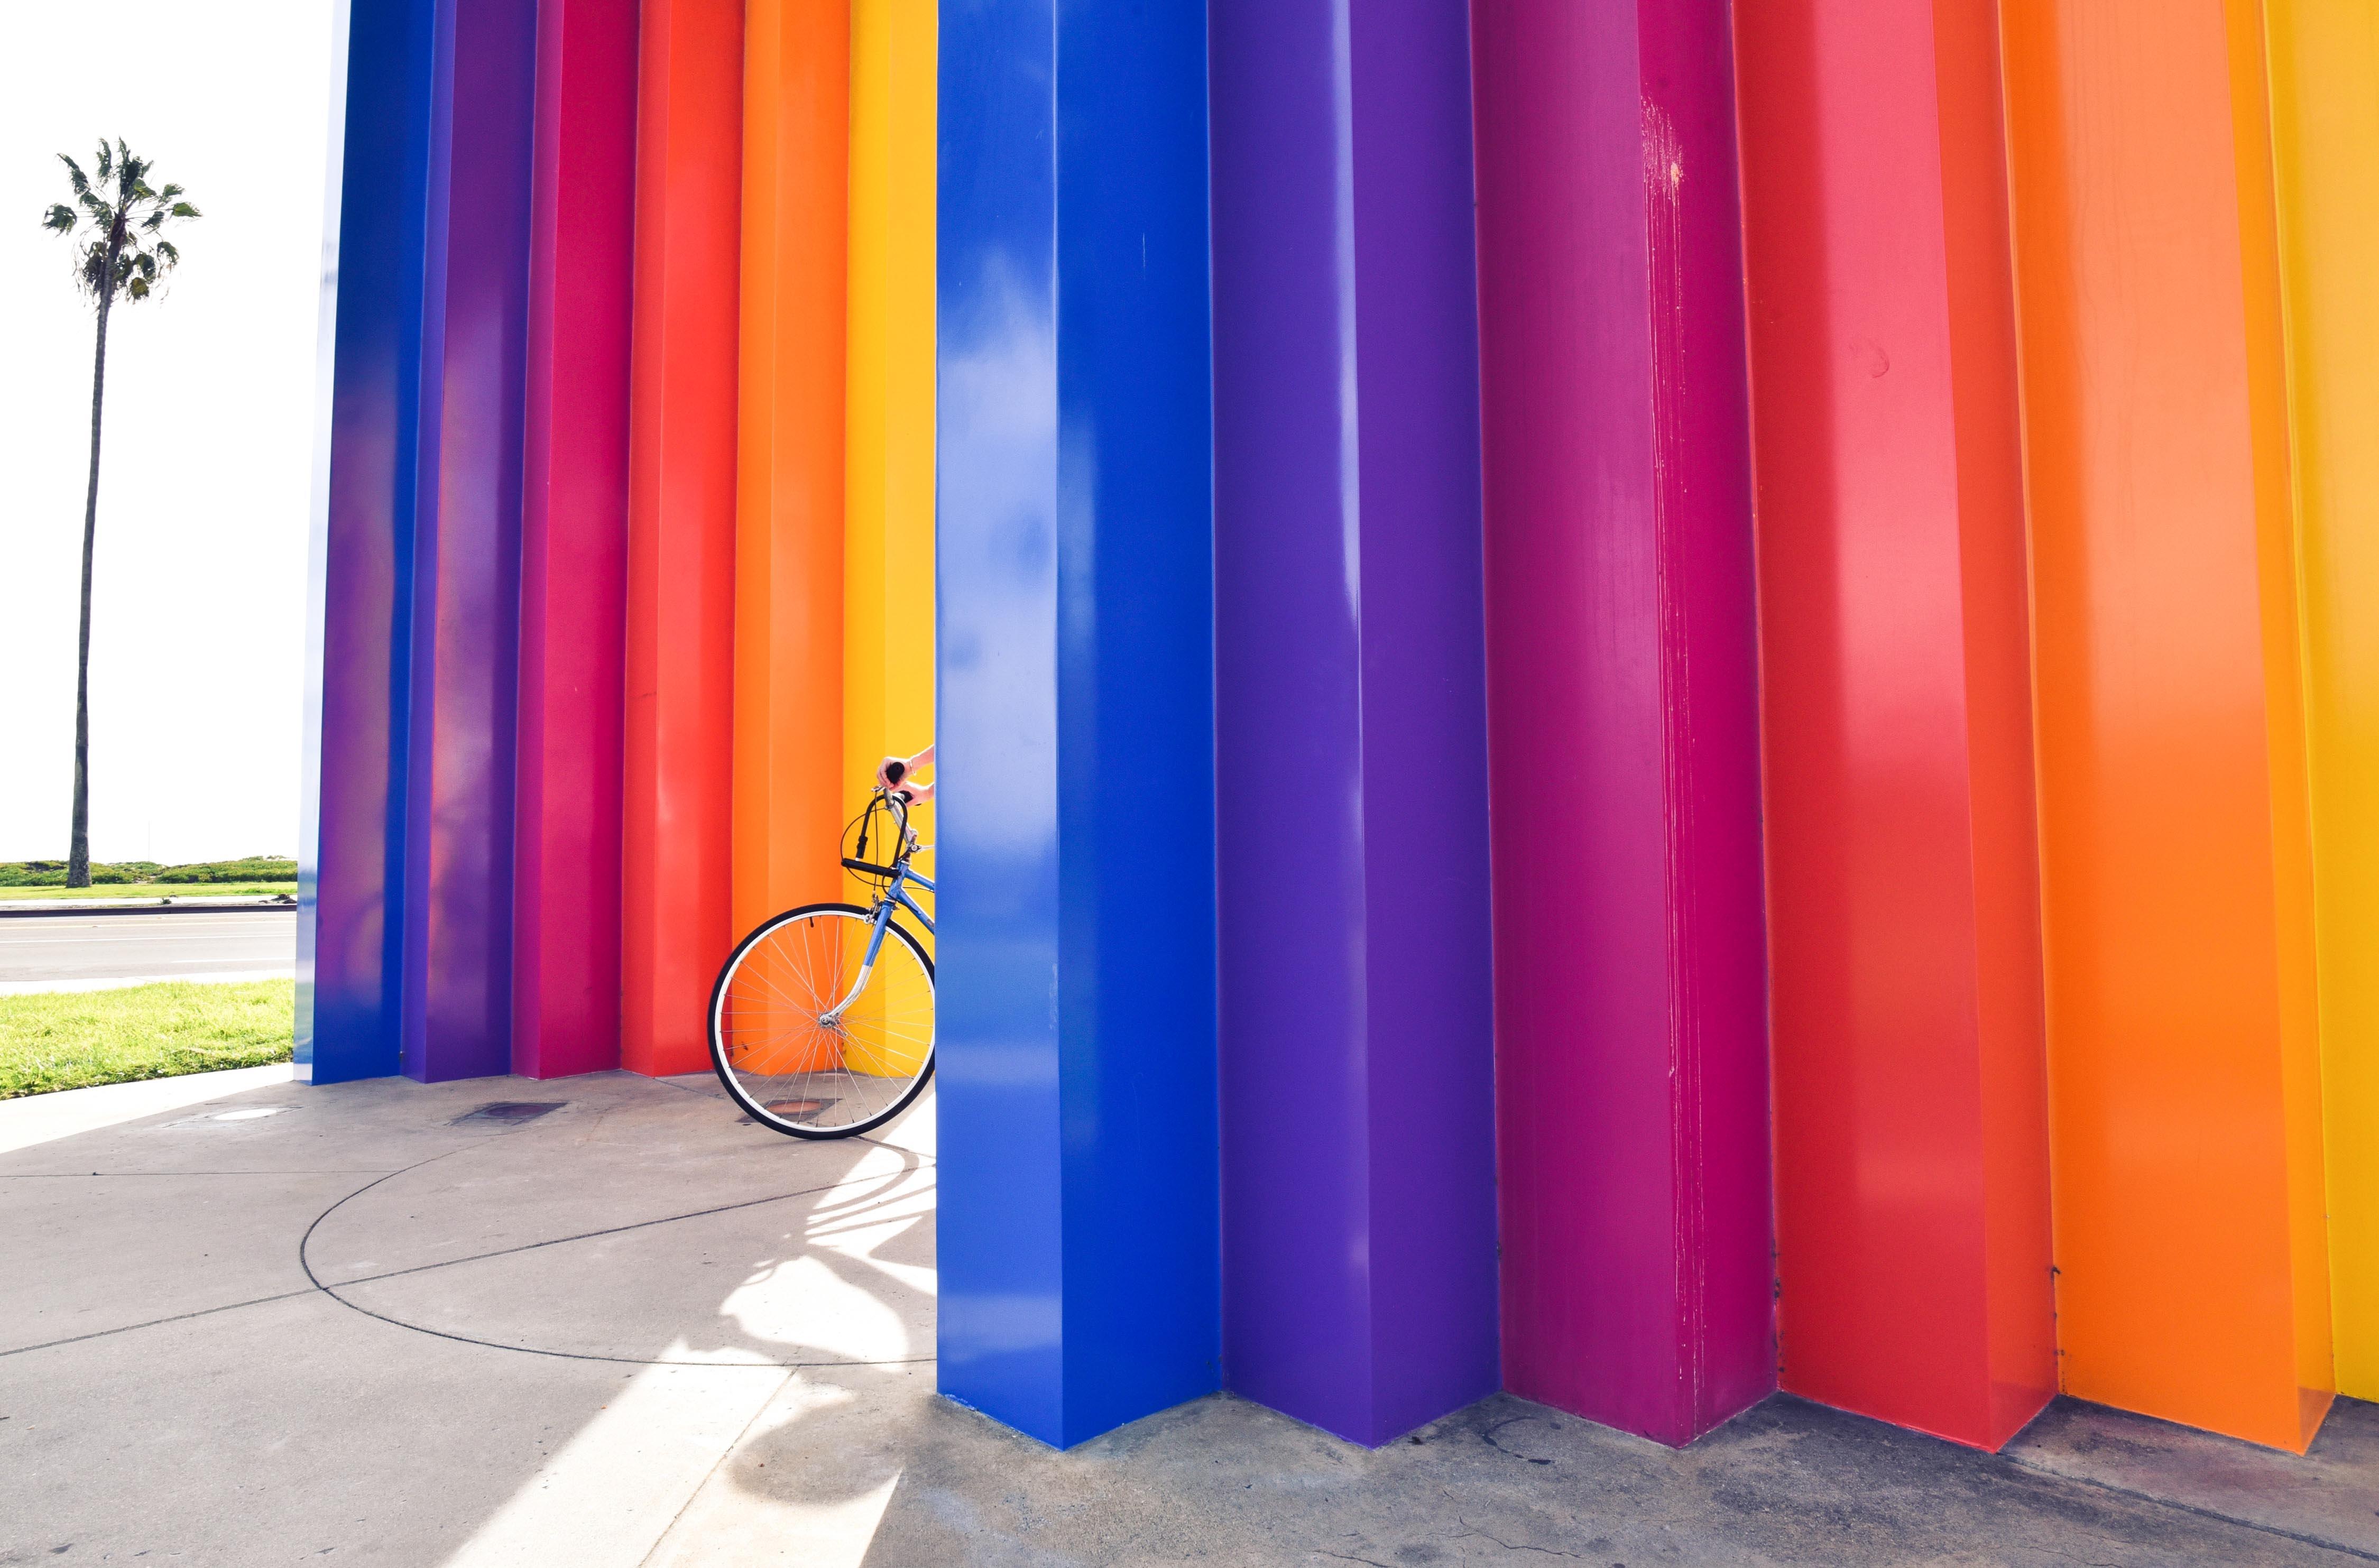 Free Images Play Purple Bicycle Bike Wall Orange